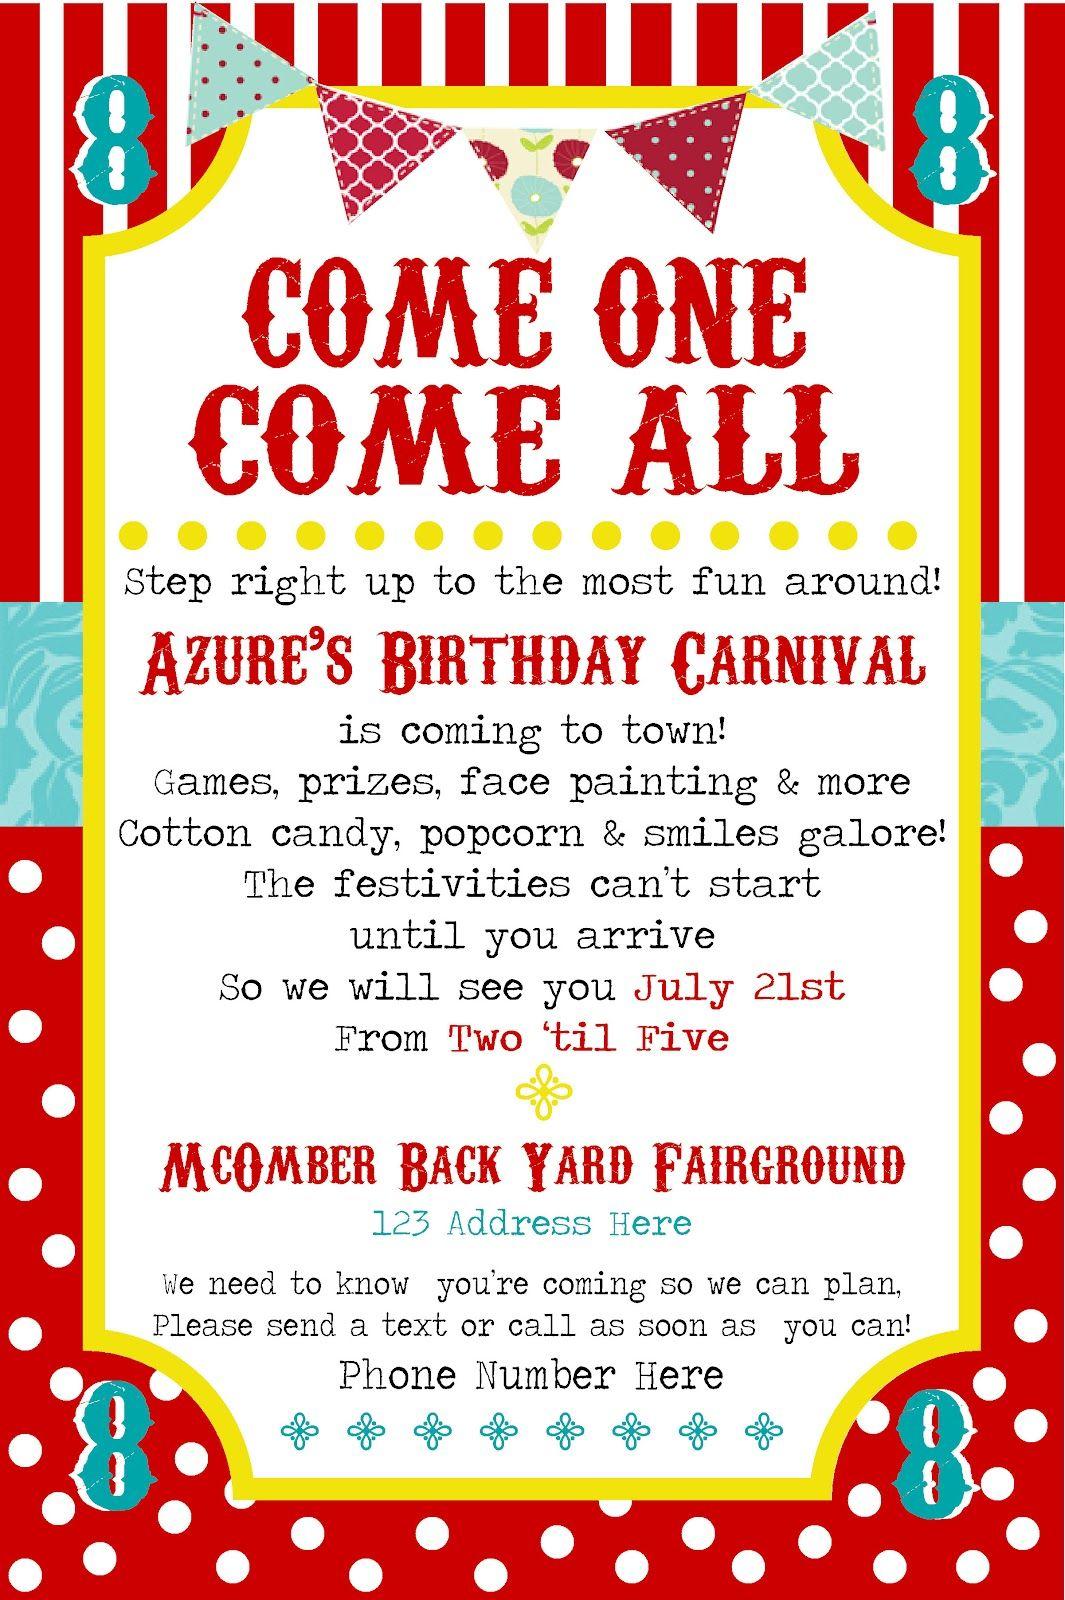 SimplyCumorah: Carnival Party ~ Behind the Scenes | State Fair ...